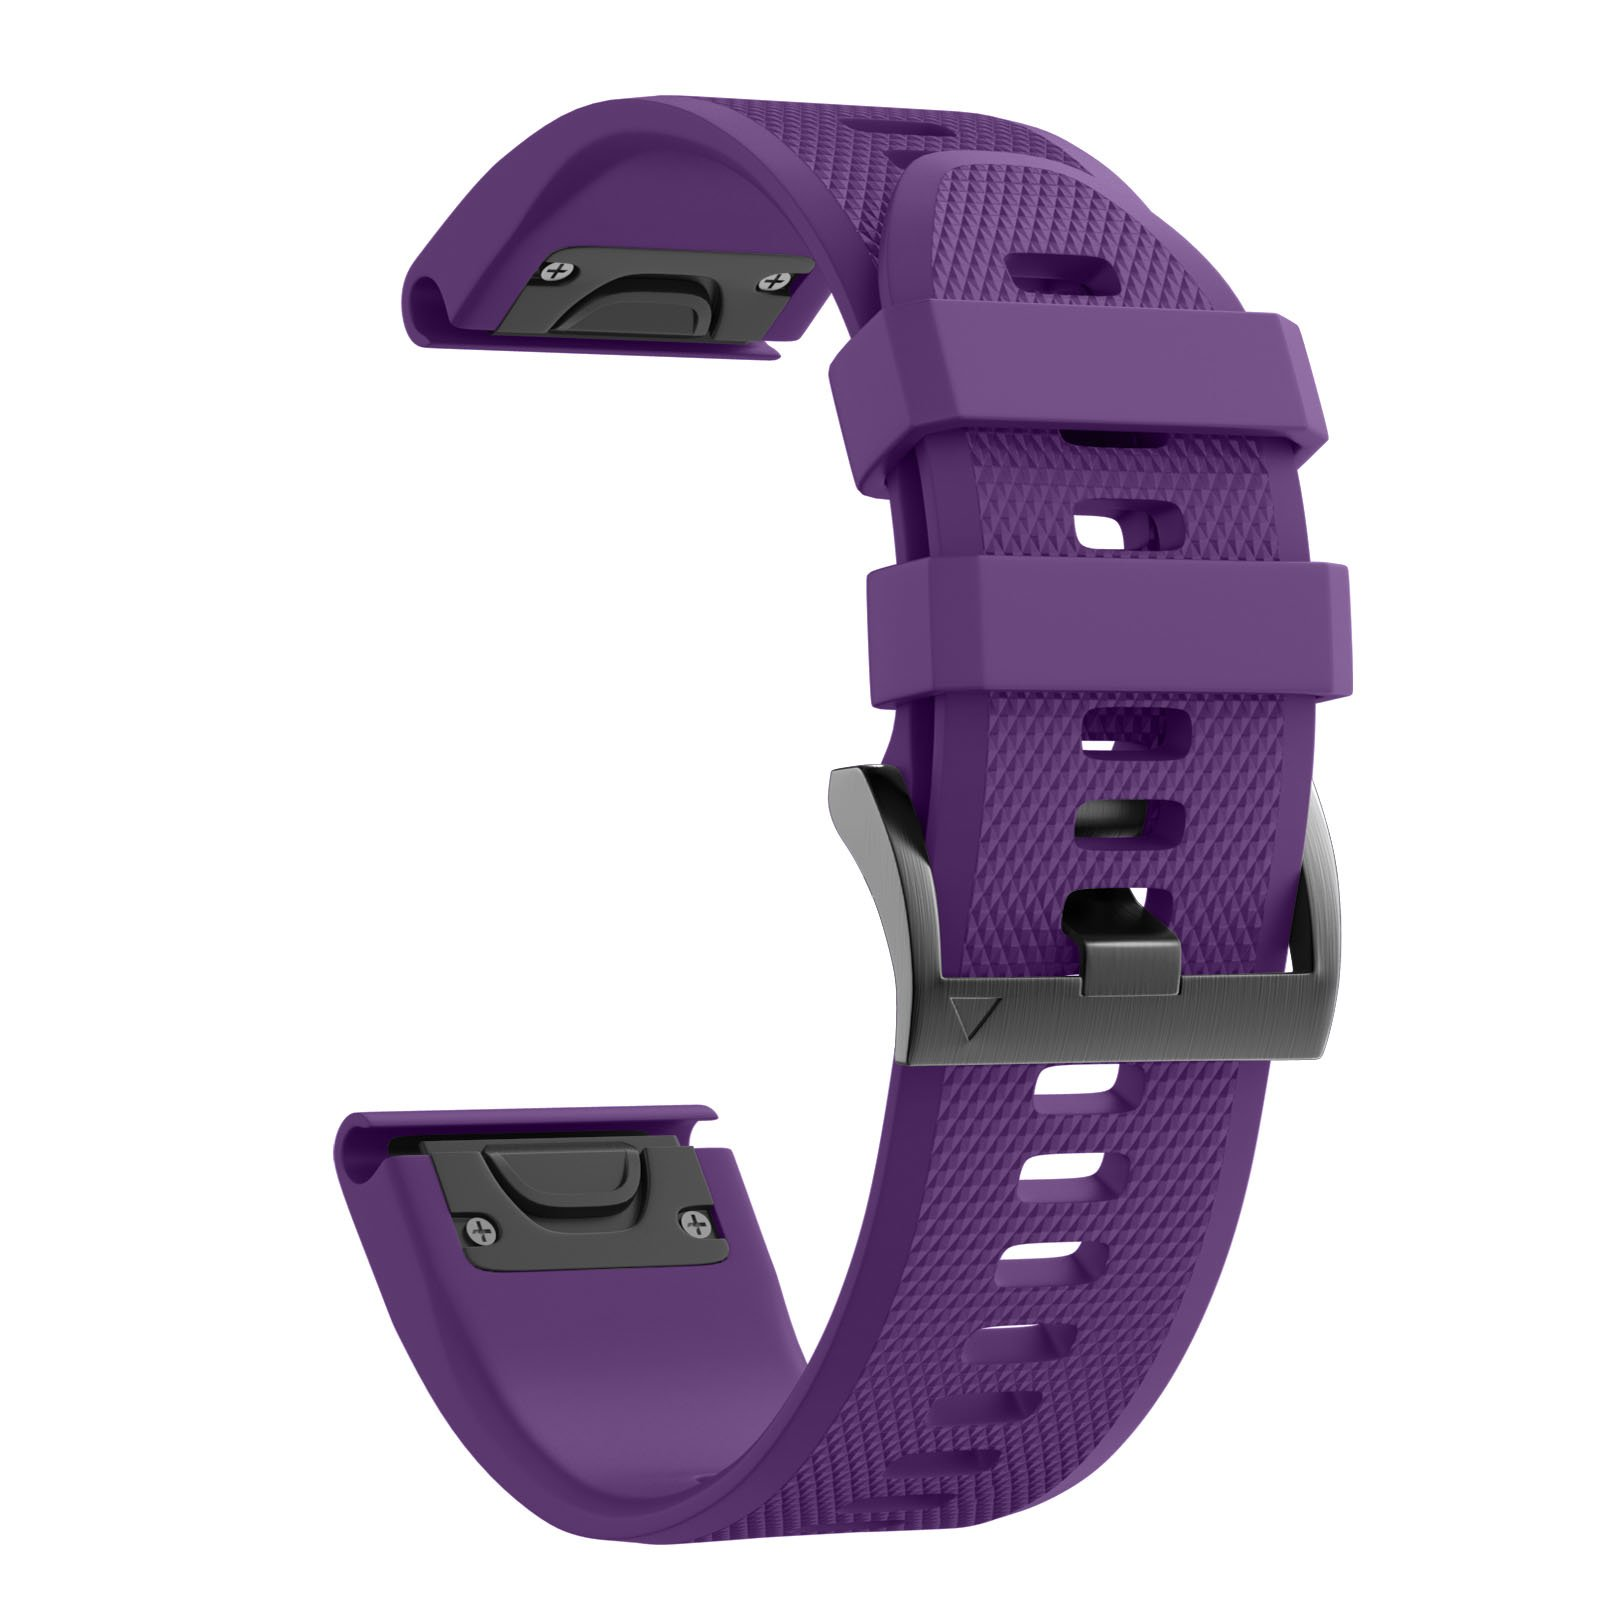 ANCOOL Compatible Garmin Fenix 5 Band Easy Fit 22mm Width Soft Silicone Watch Strap Compatible Garmin Fenix 5/Fenix 5 Plus/Forerunner 935/Approach S60/Quatix 5 - Purple